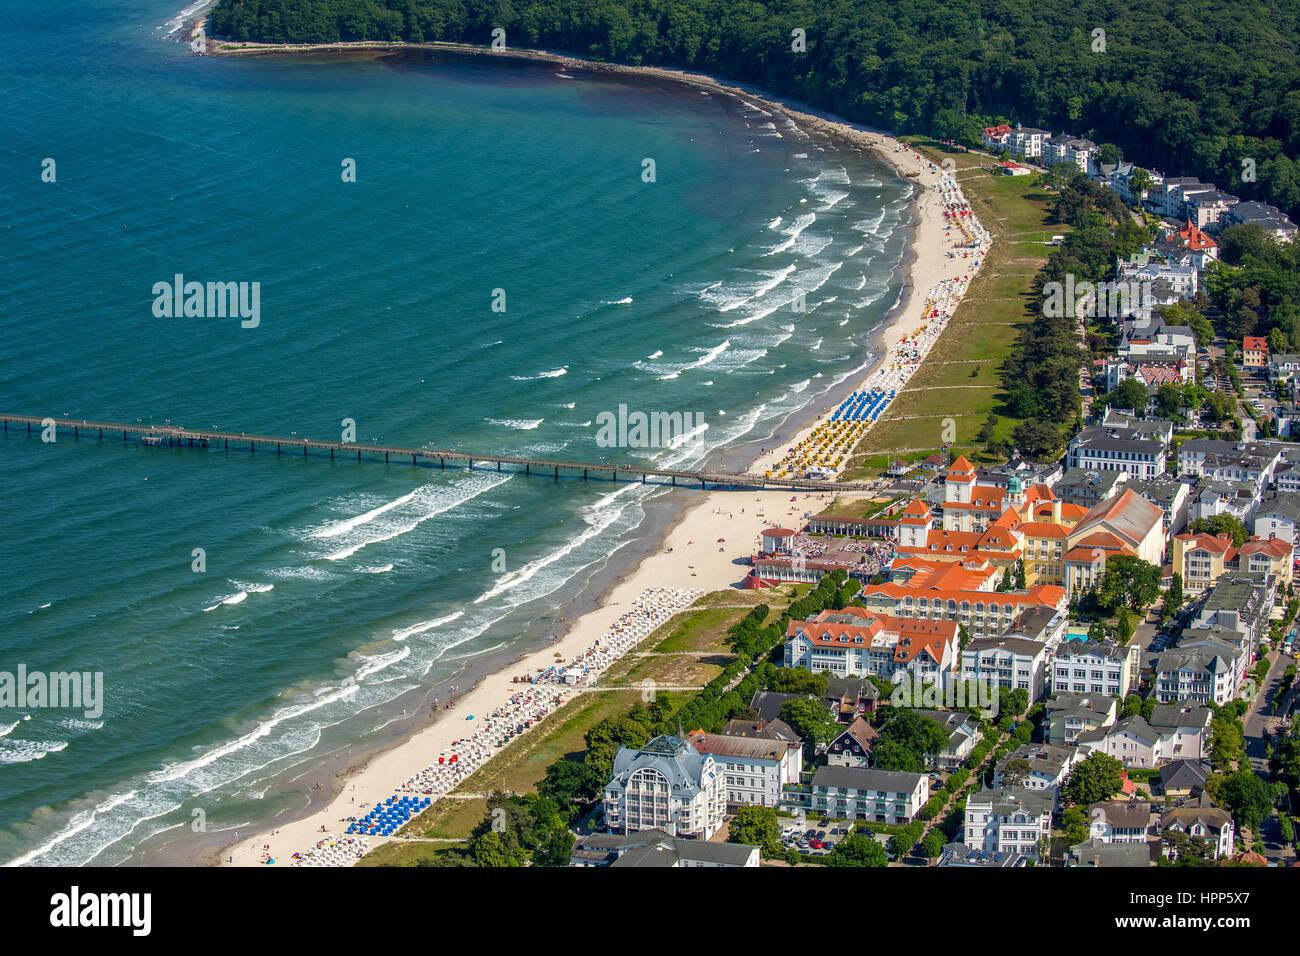 Beach with spa house, Baltic seaside resort Binz, Baltic coast, Mecklenburg-Western Pomerania, Germany - Stock Image